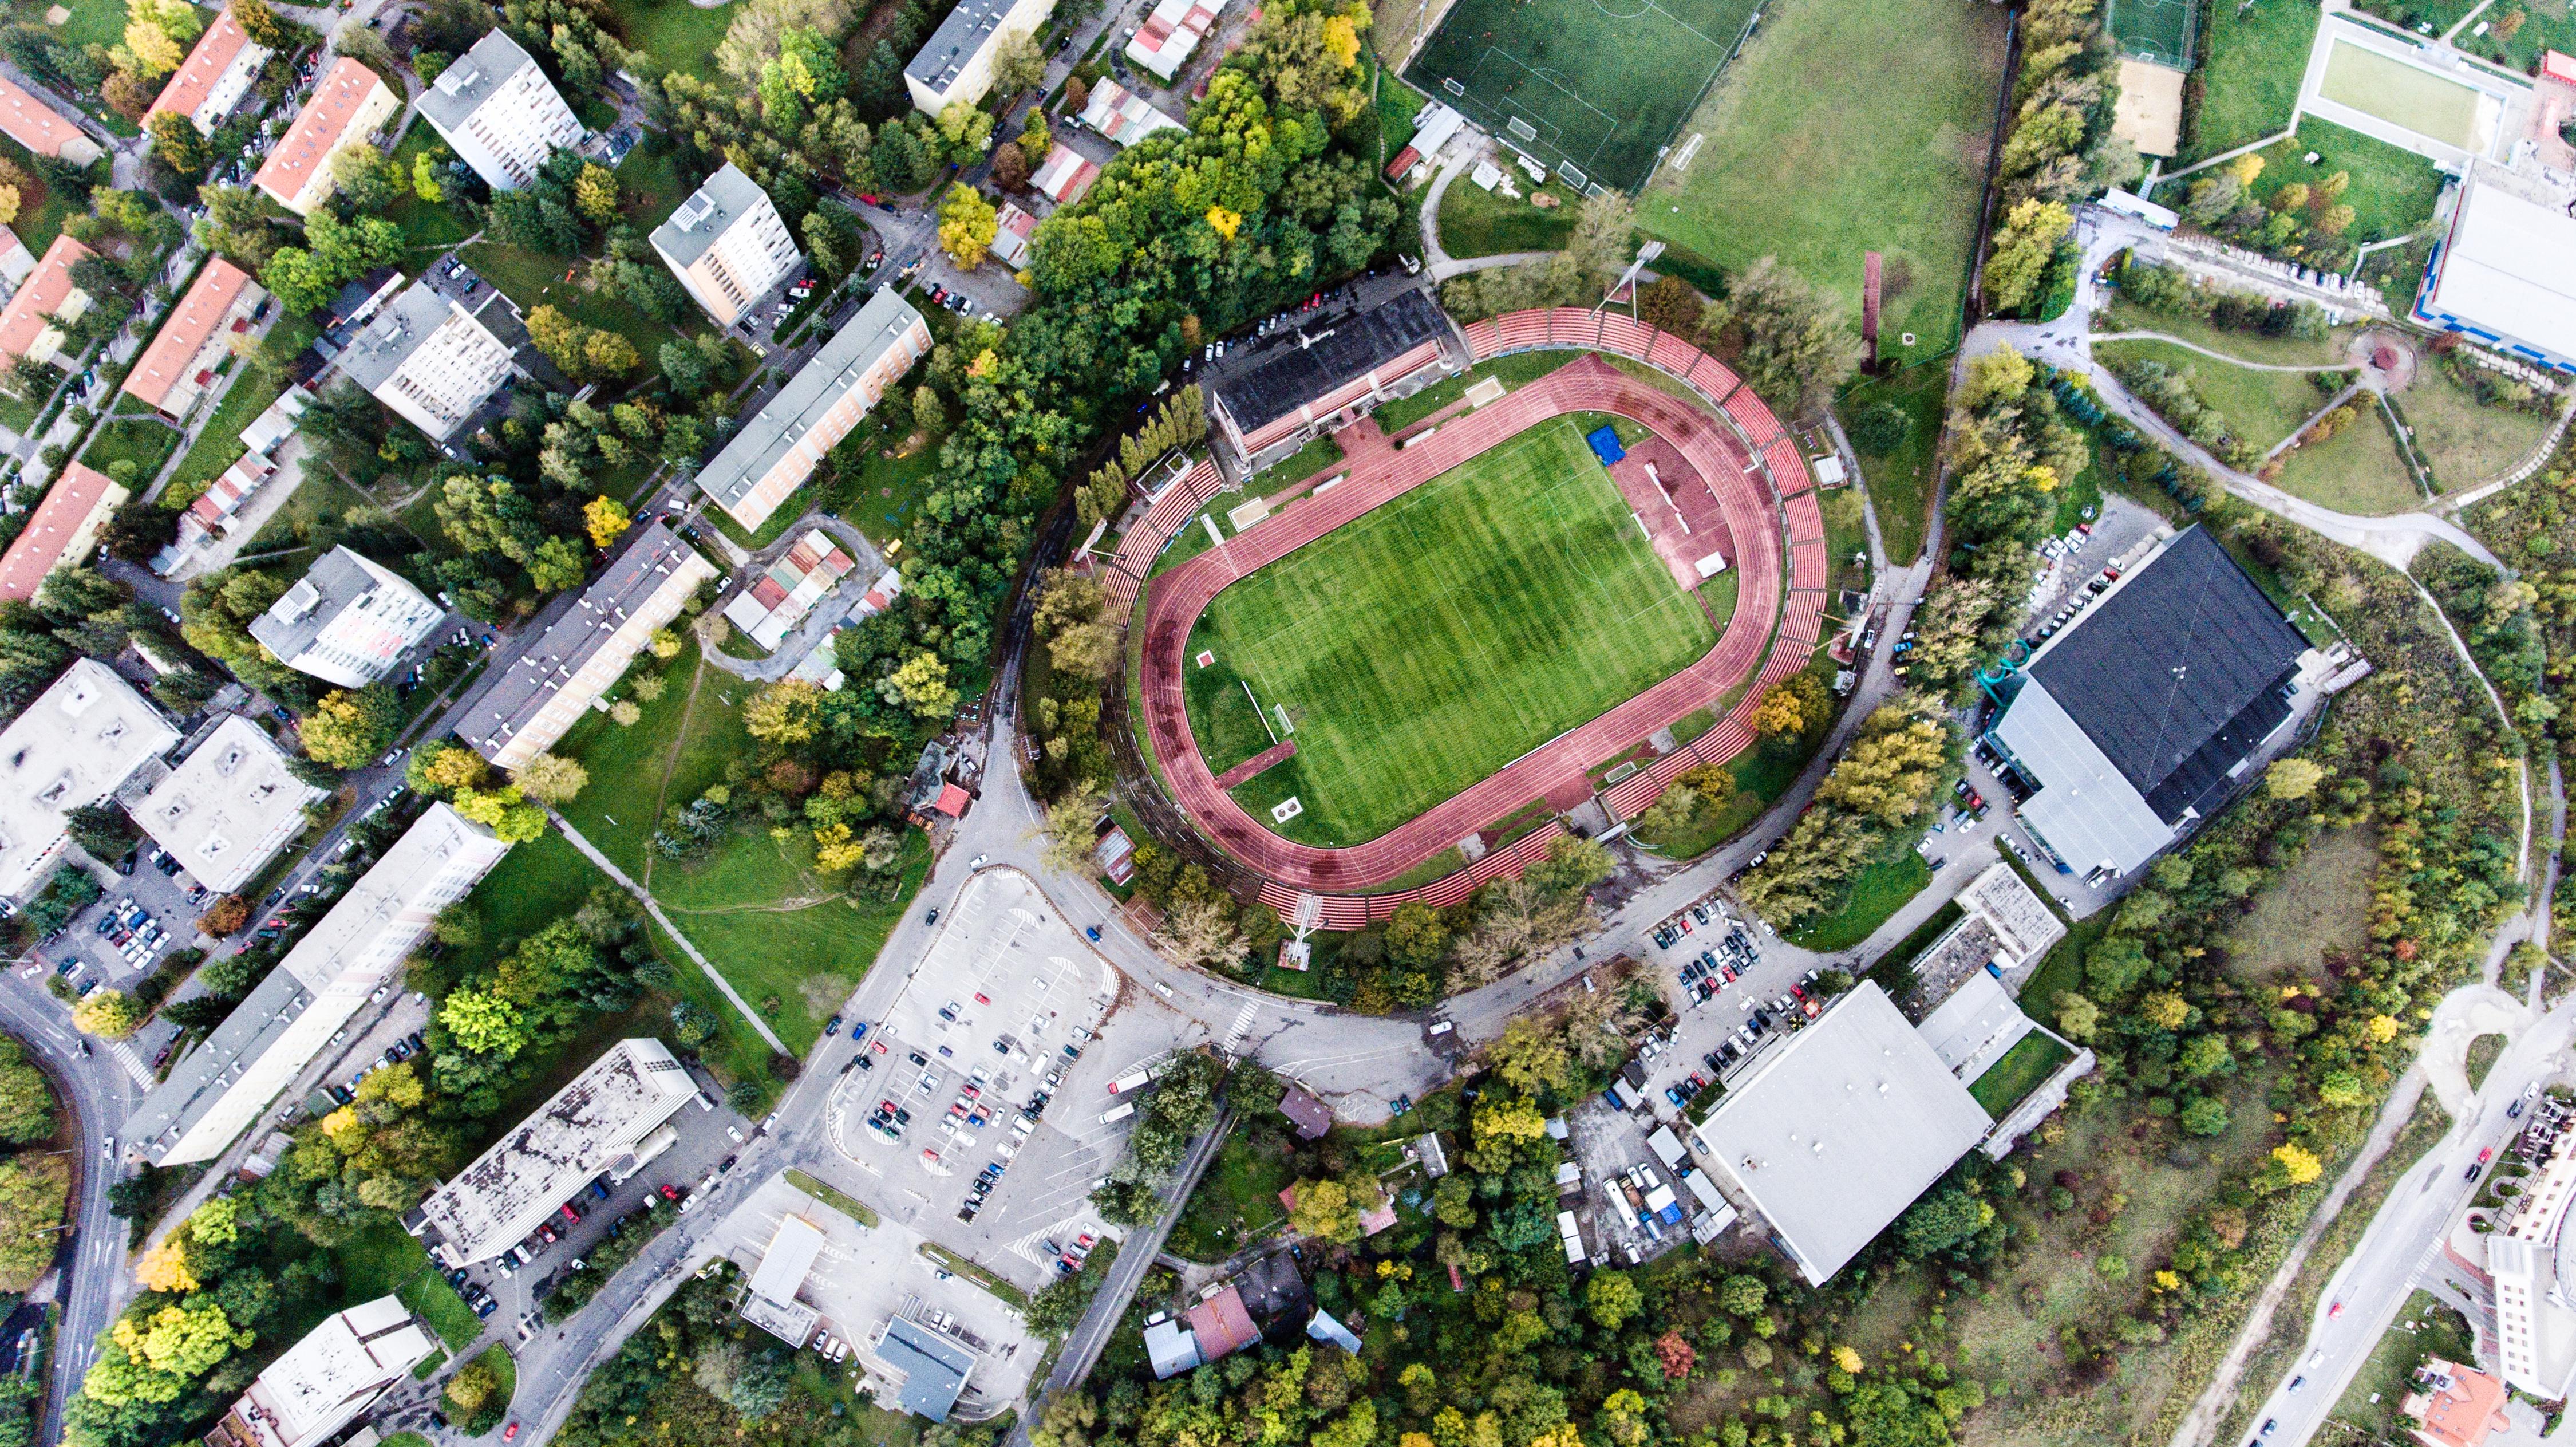 Aerial view of football stadium in town, Banska Bystrica, Slovak